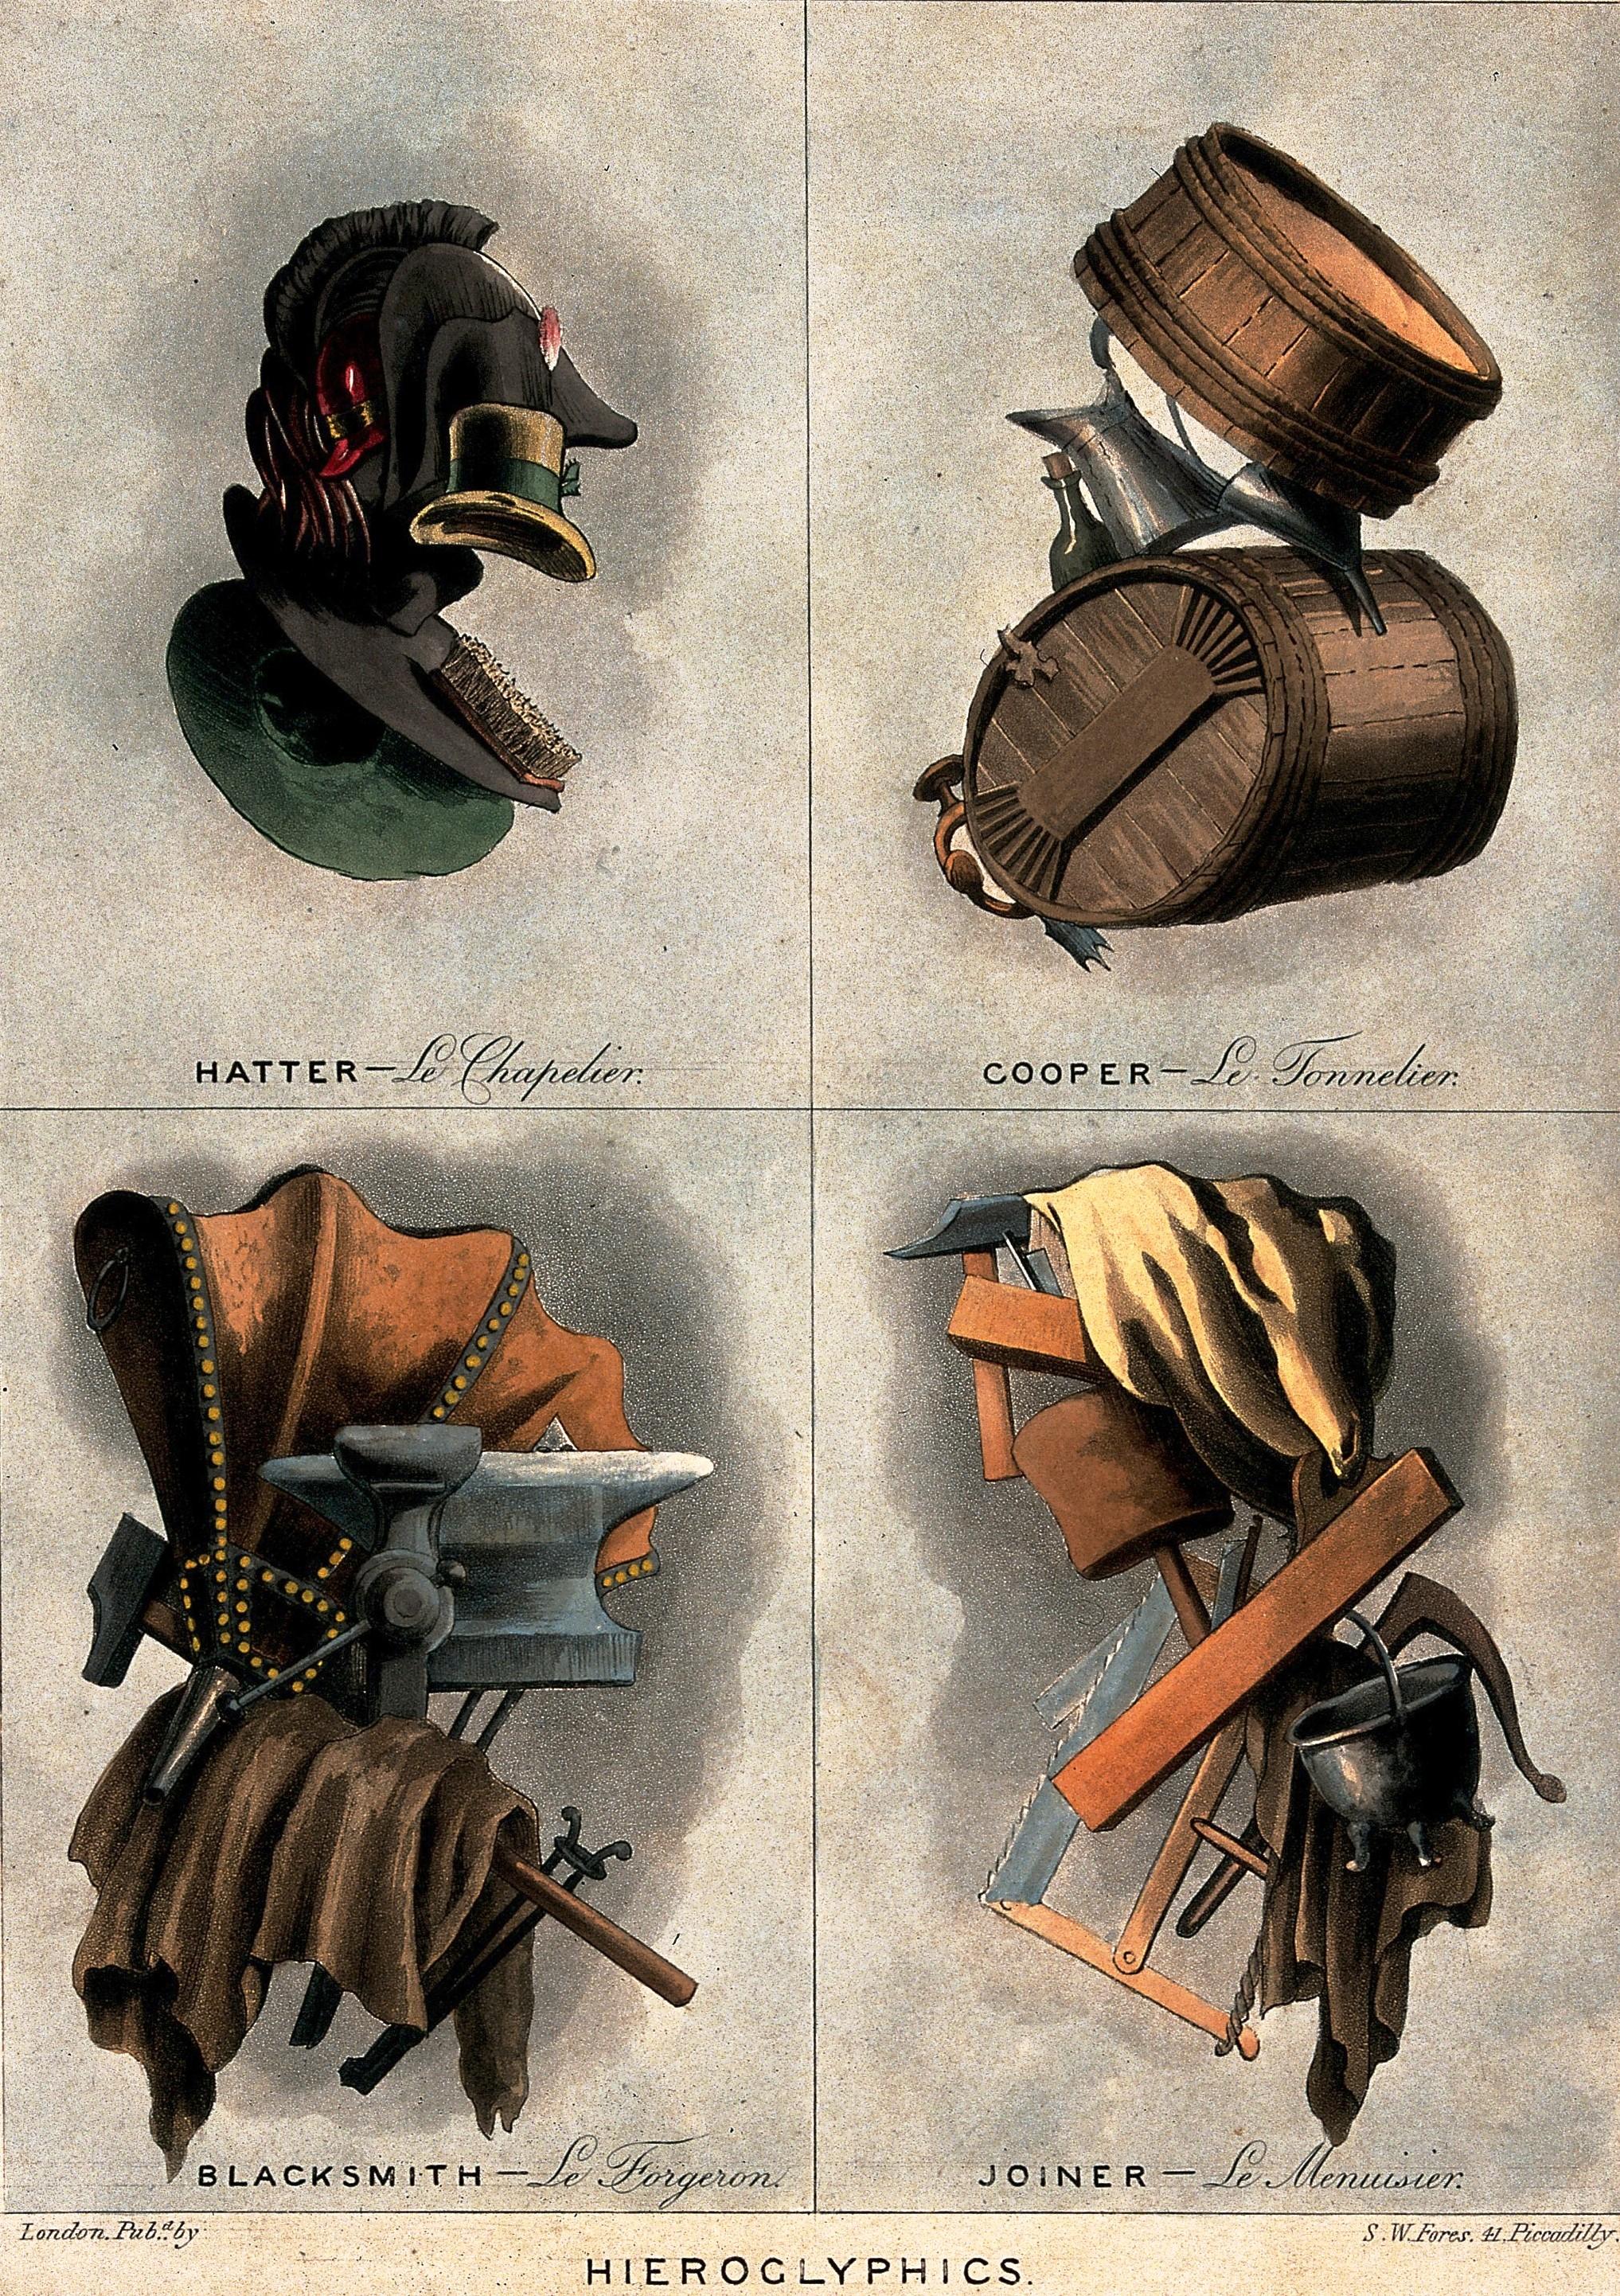 Шляпник, бондарь, кузнец, столяр, около 1800.